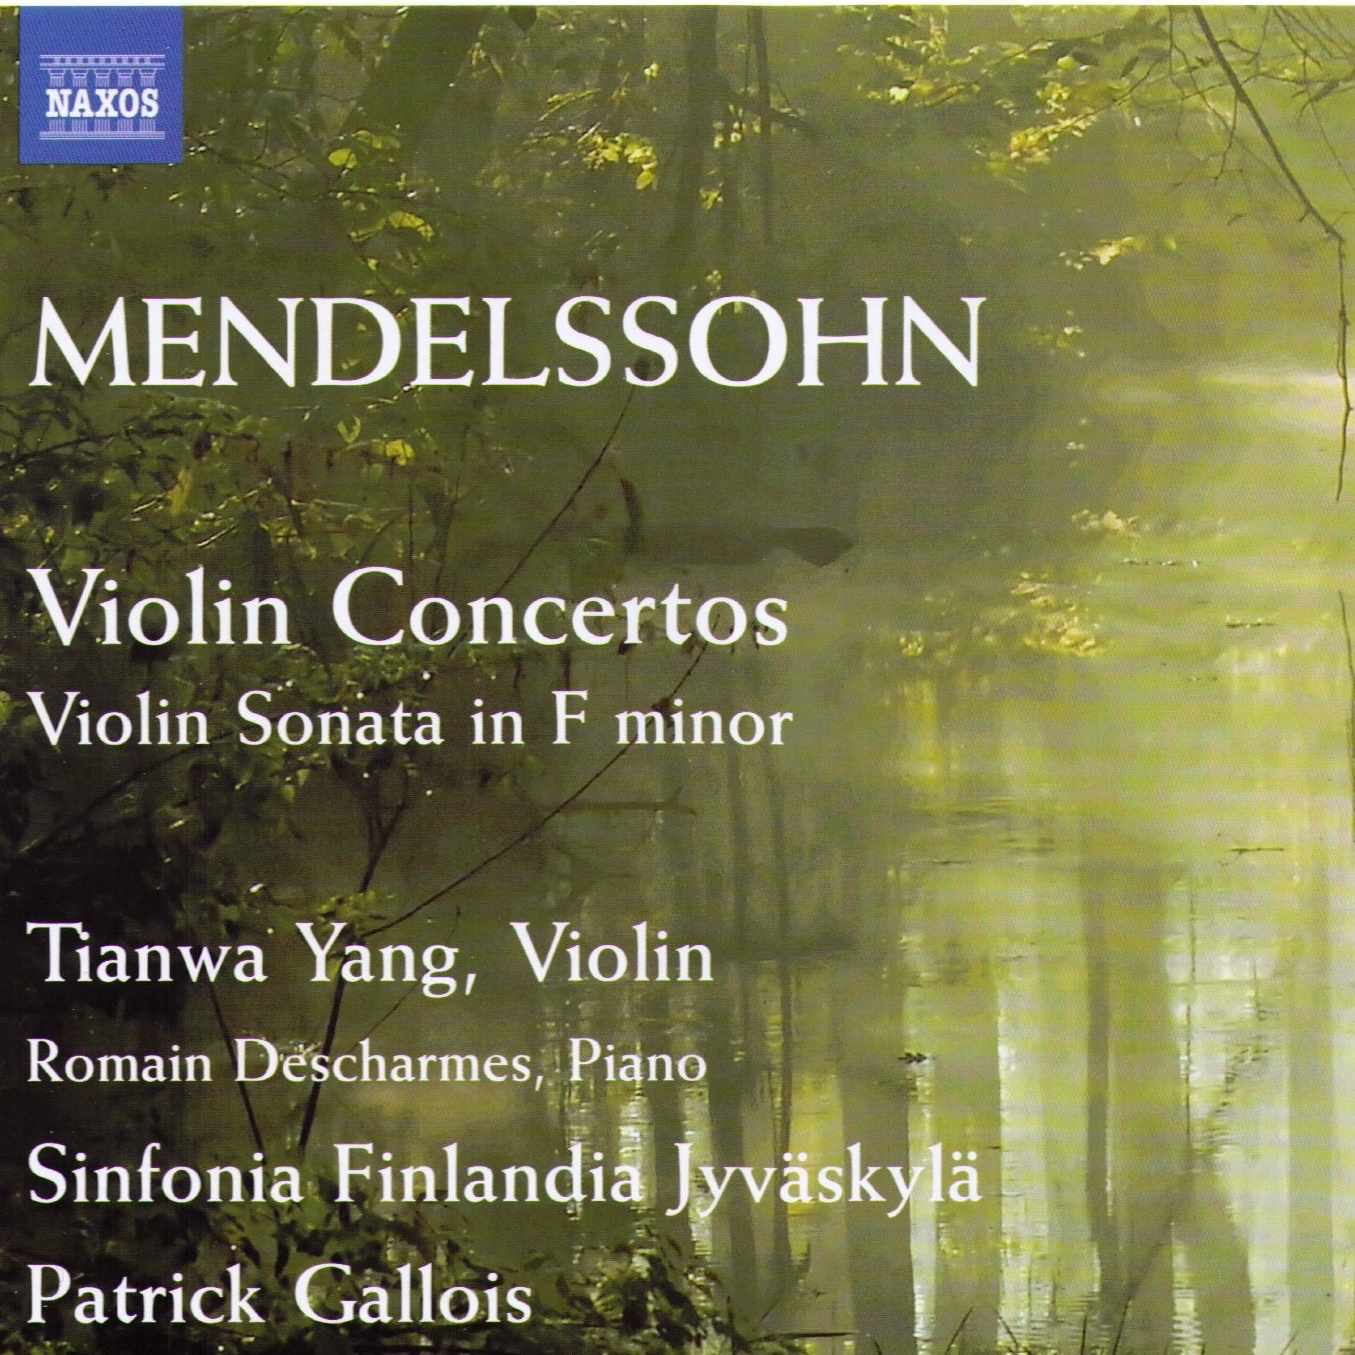 Felix Mendelssohn Bartholdy  Violin Concertos, Sonata F minor (1823)  Tianwa Yang, Violine Sinfonia Finlandia Jyväskylä Patrick Gallois Romain Descharmes, Klavier Label: NAXOS 8.572662   Mehr Info      Rezensionen